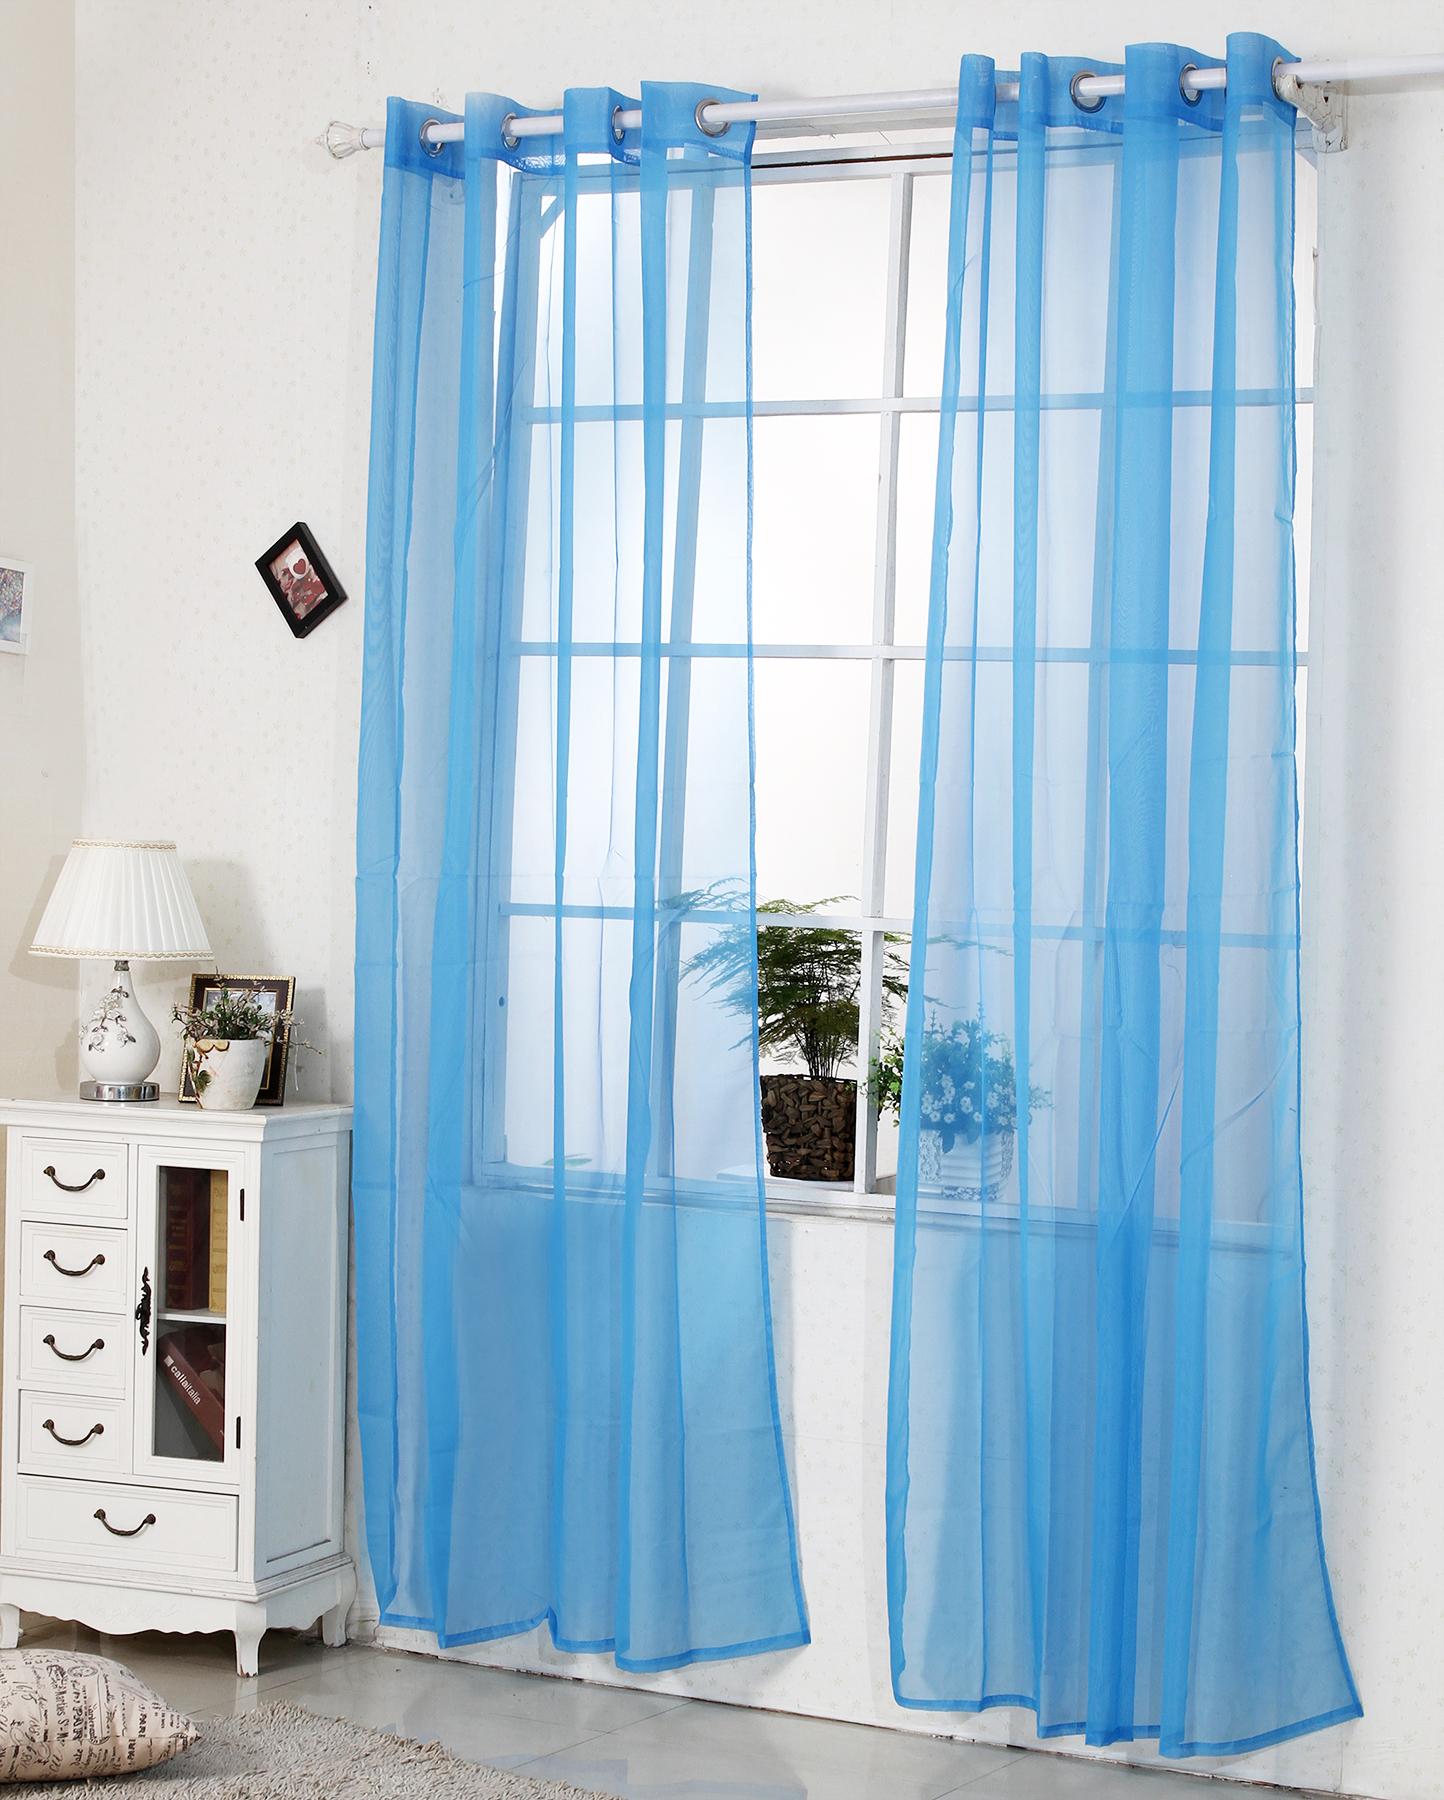 fenster schal fabulous cystyle er gardinen vorhnge transparent leinen optik mit kruselband. Black Bedroom Furniture Sets. Home Design Ideas